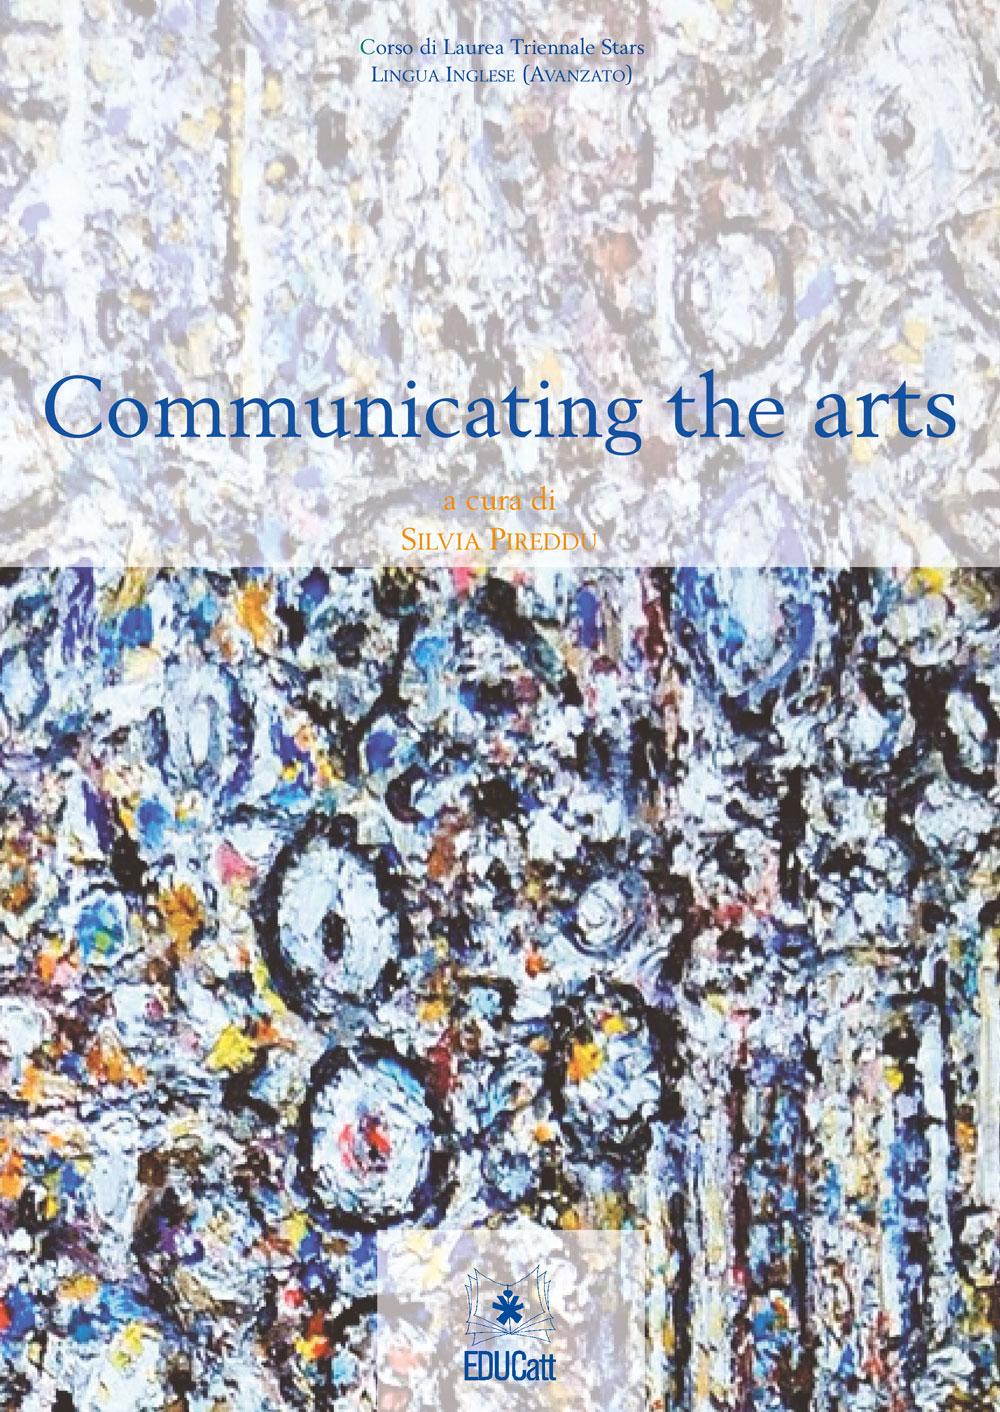 COMMUNICATING THE ARTS